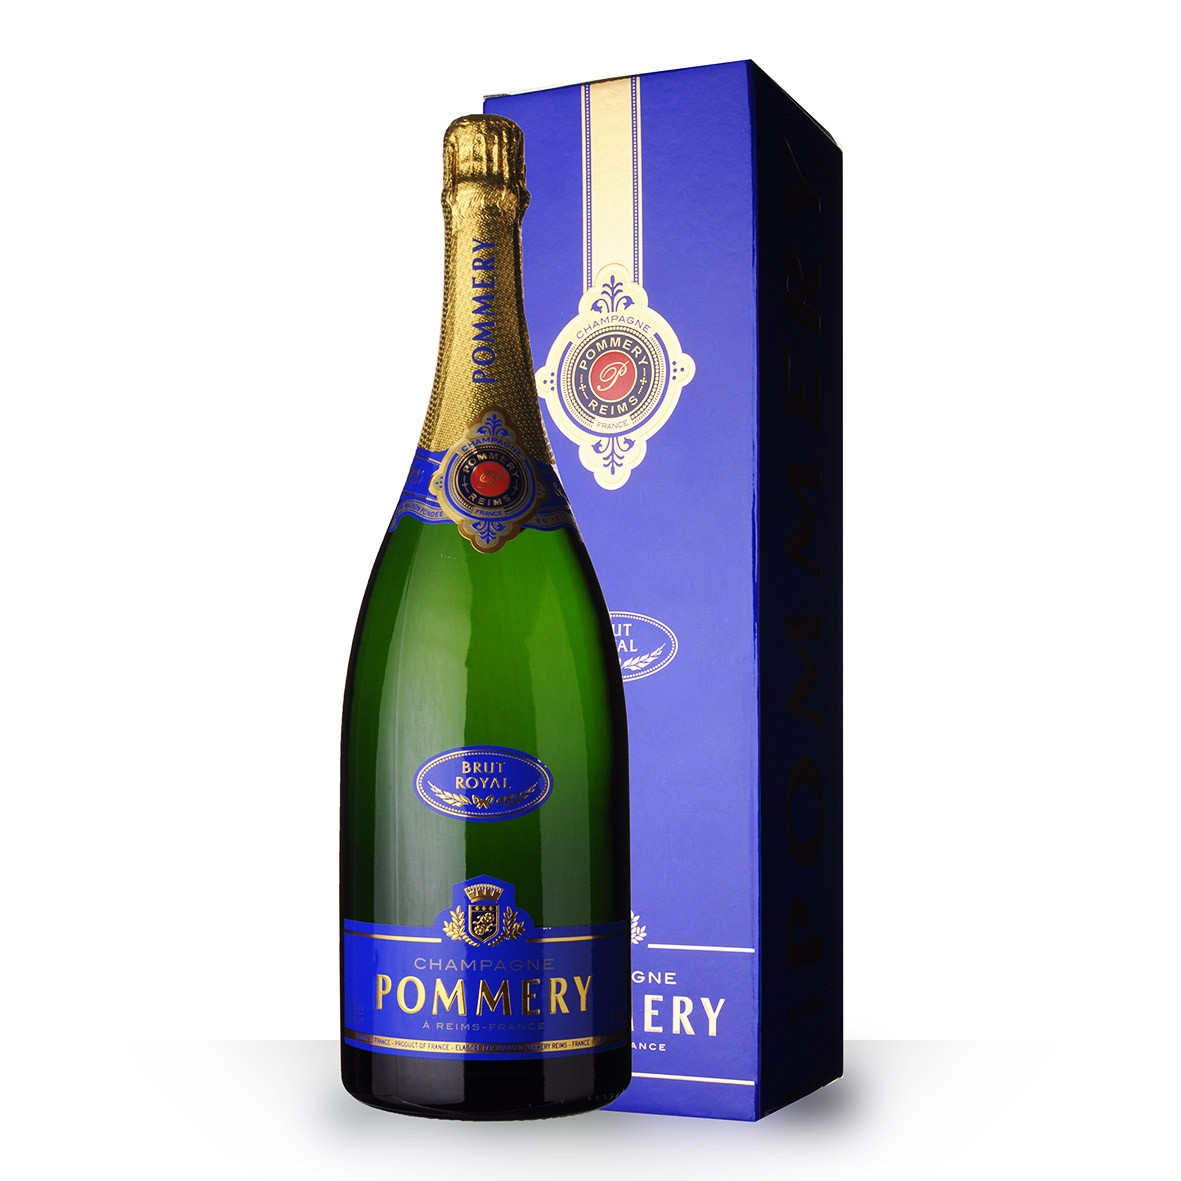 Champagne Pommery Brut Royal 150cl Etui www.odyssee-vins.com